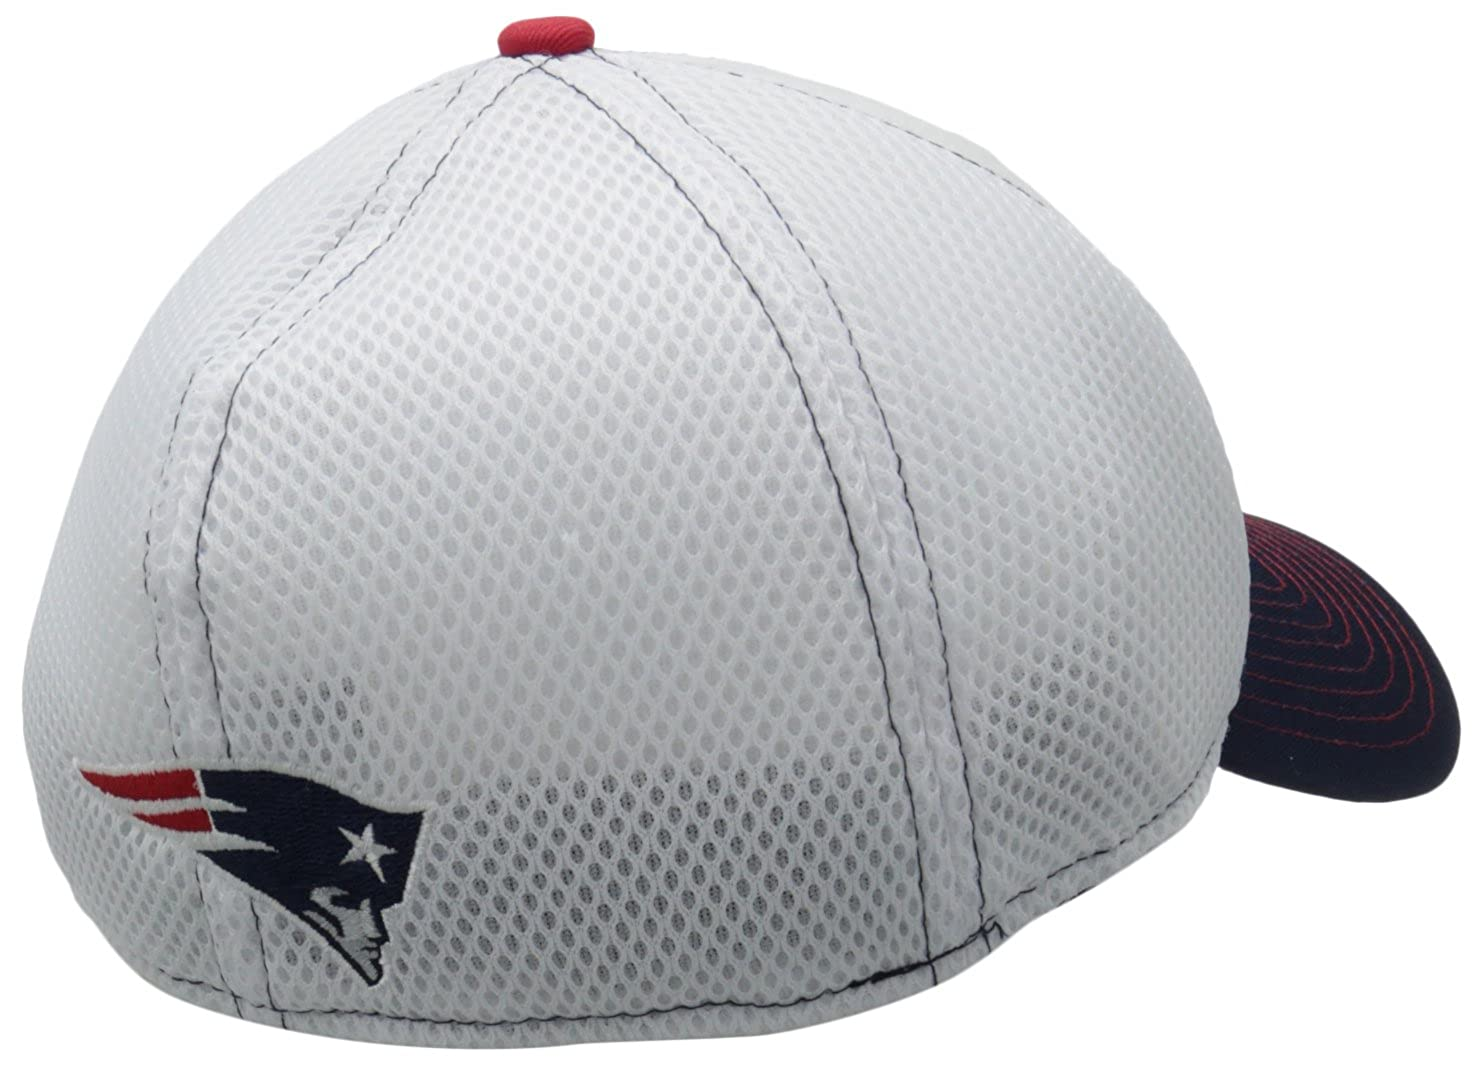 cc86853d9d6 Amazon.com   NFL New England Patriots Blitz Neo 39Thirty Flex Fit ...